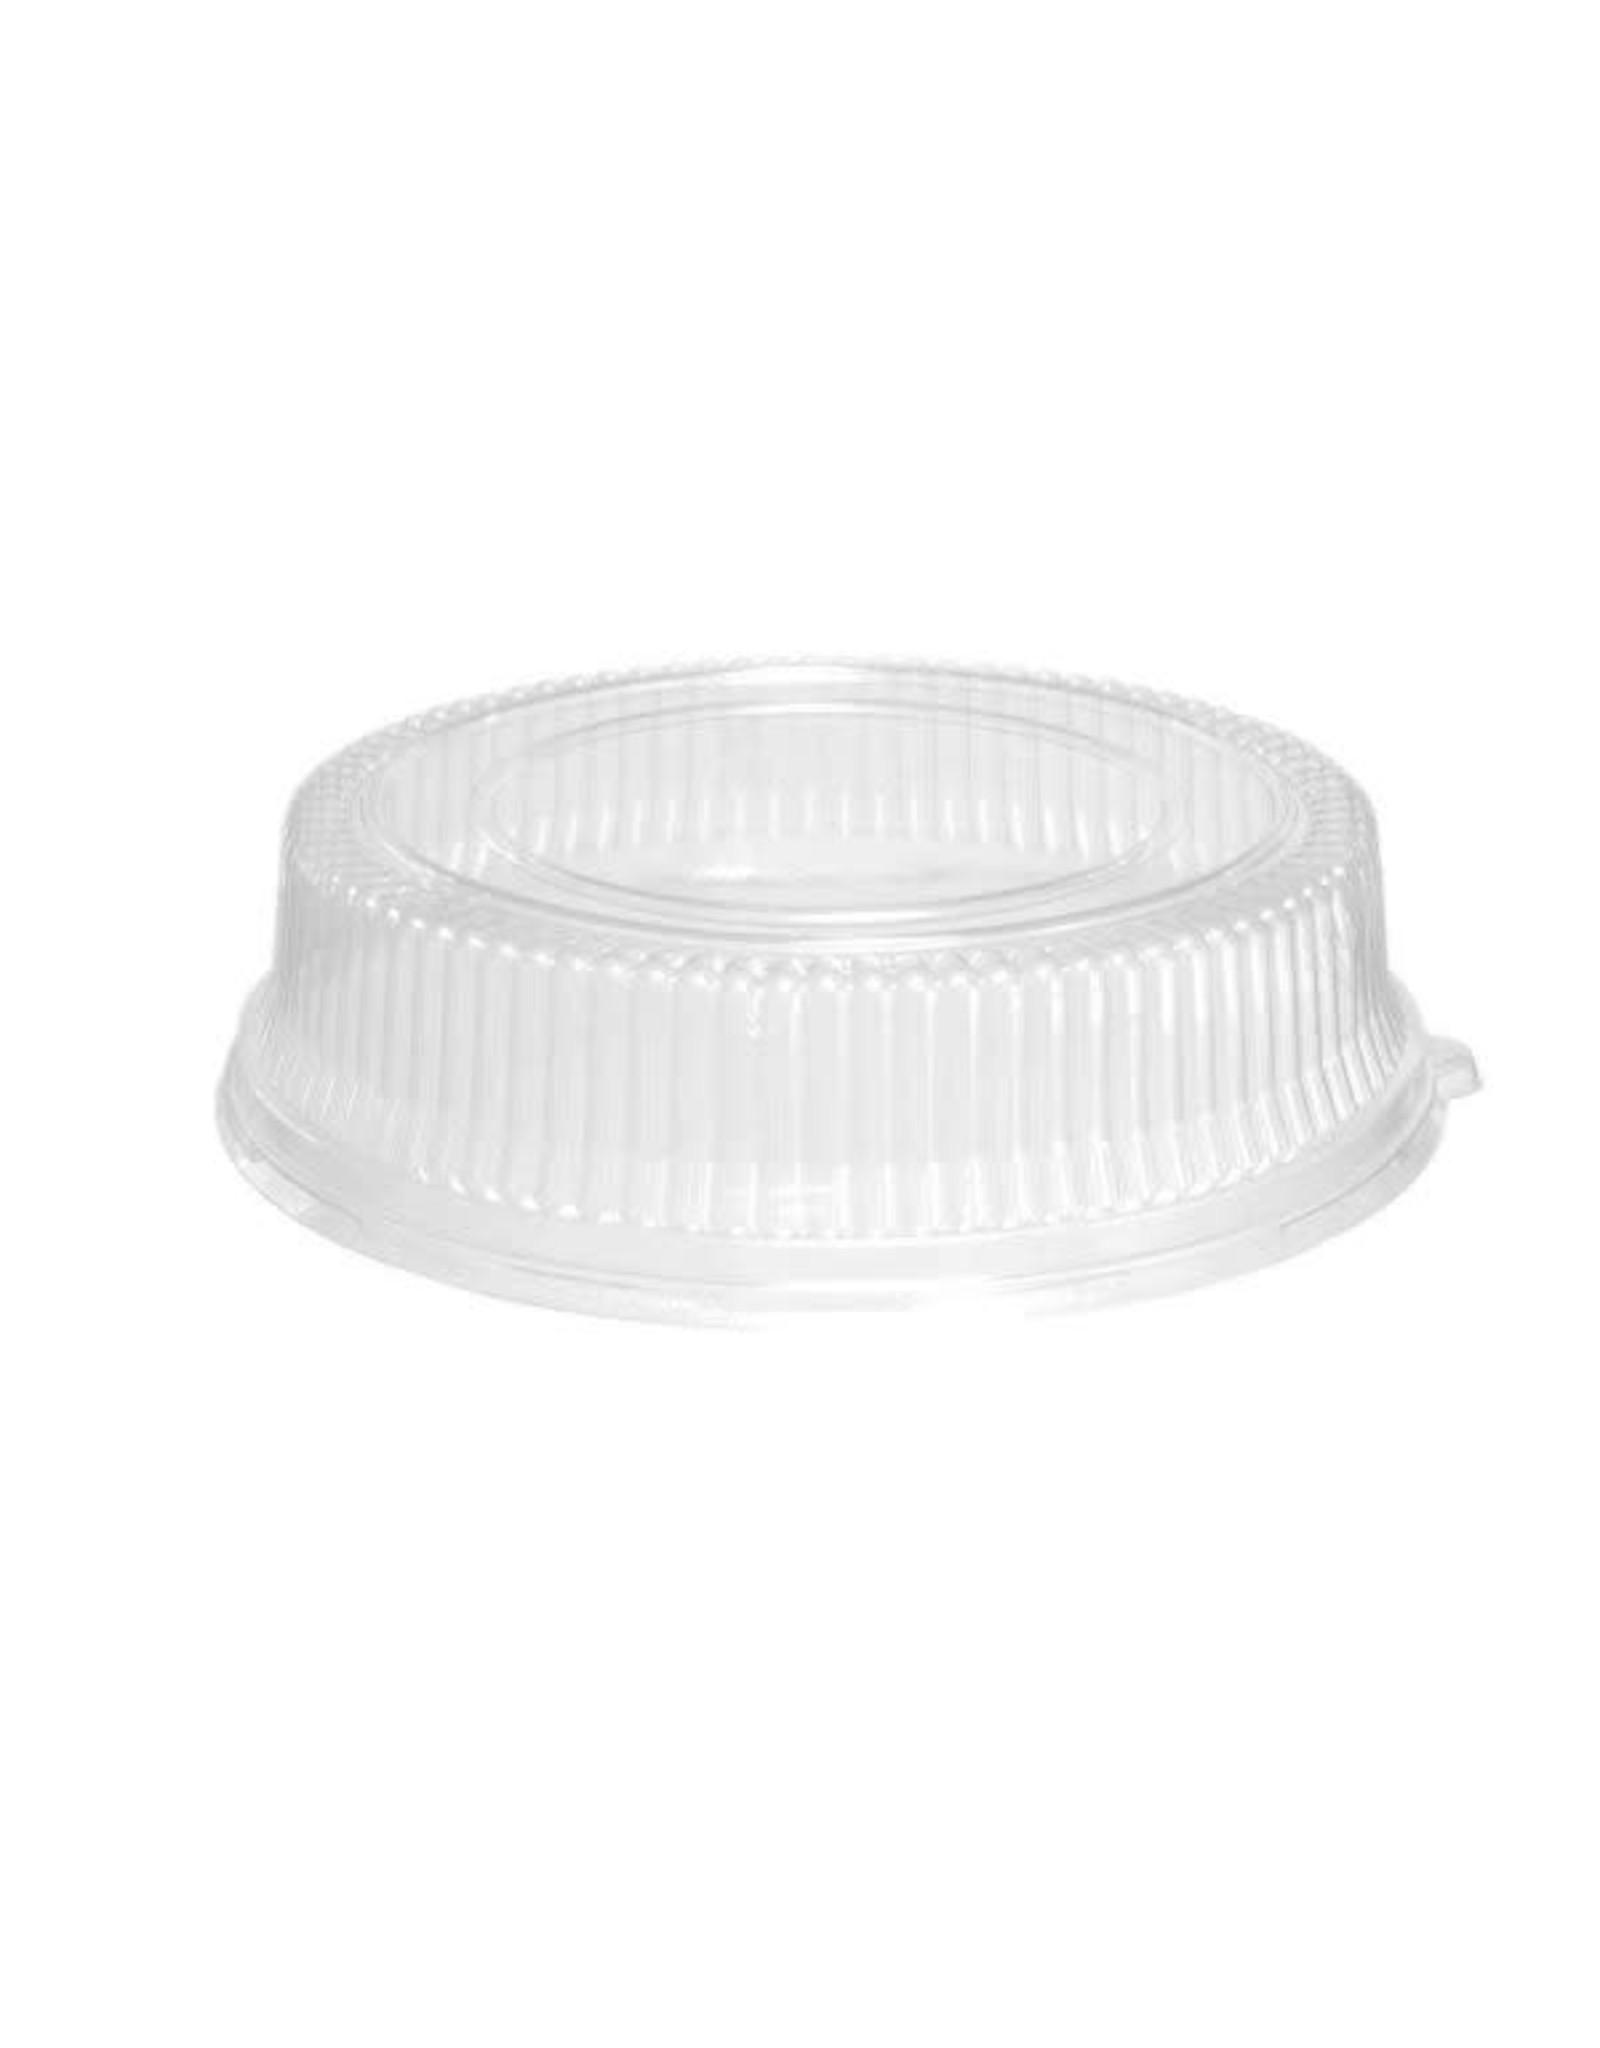 "northwest 12"" Clear Plastic Dome Lids - 1ct."